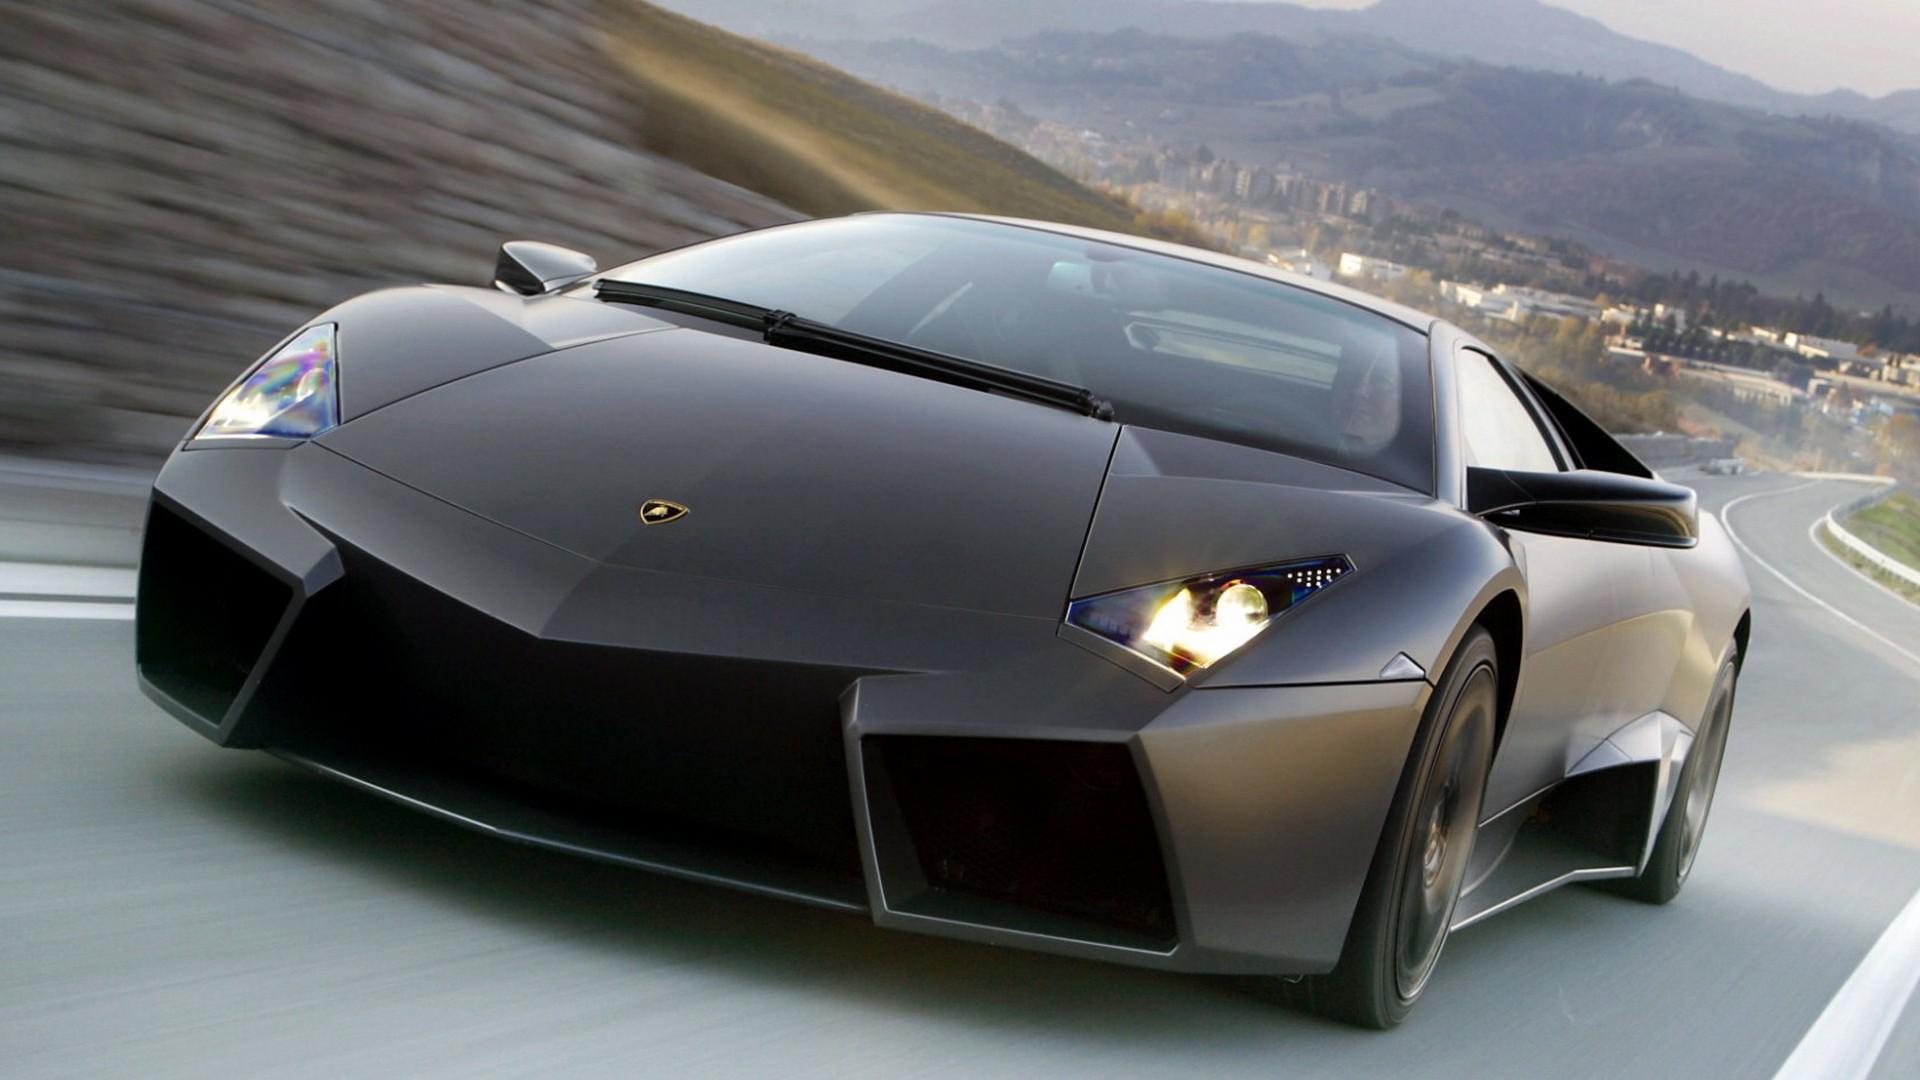 1920x1080 Px Car Lamborghini Reventon